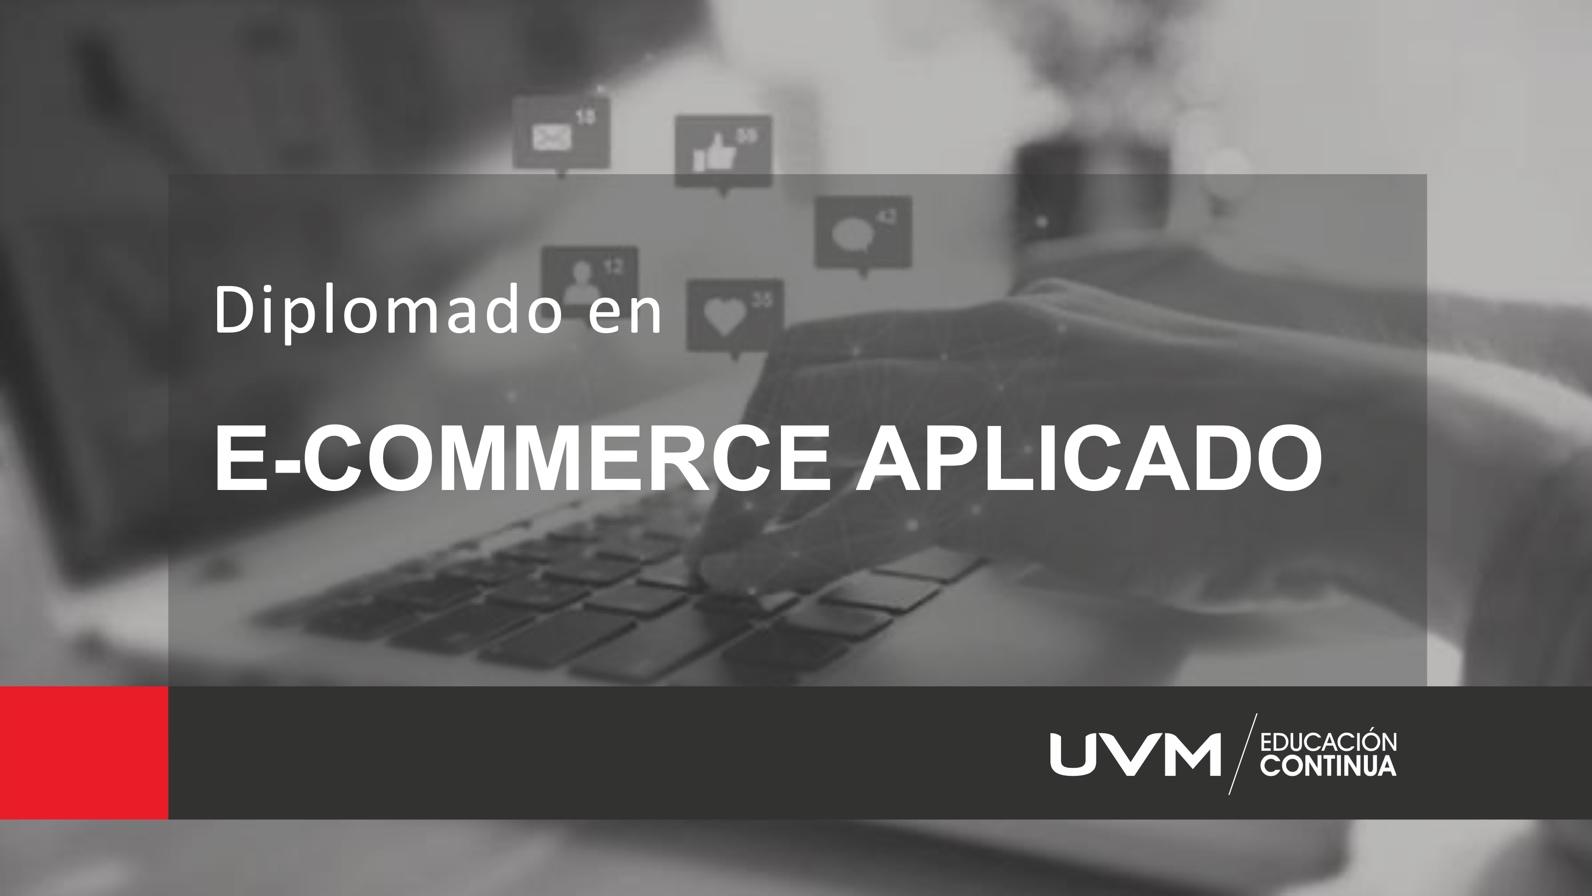 Diplomado Ecommerce Aplicado